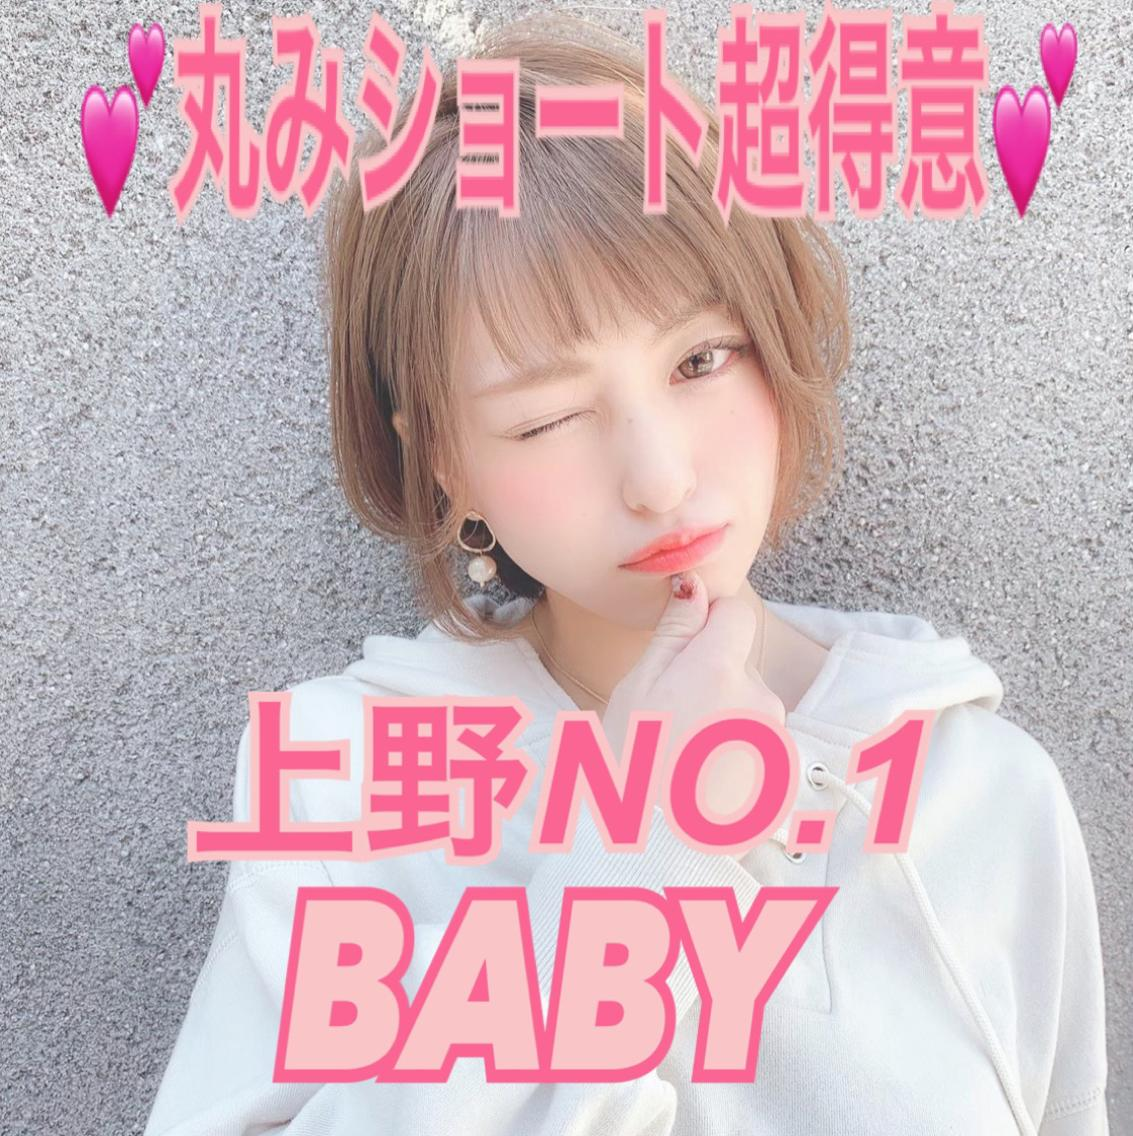 BABY所属・🦄ショートの達人🦄hiroki🦄の掲載